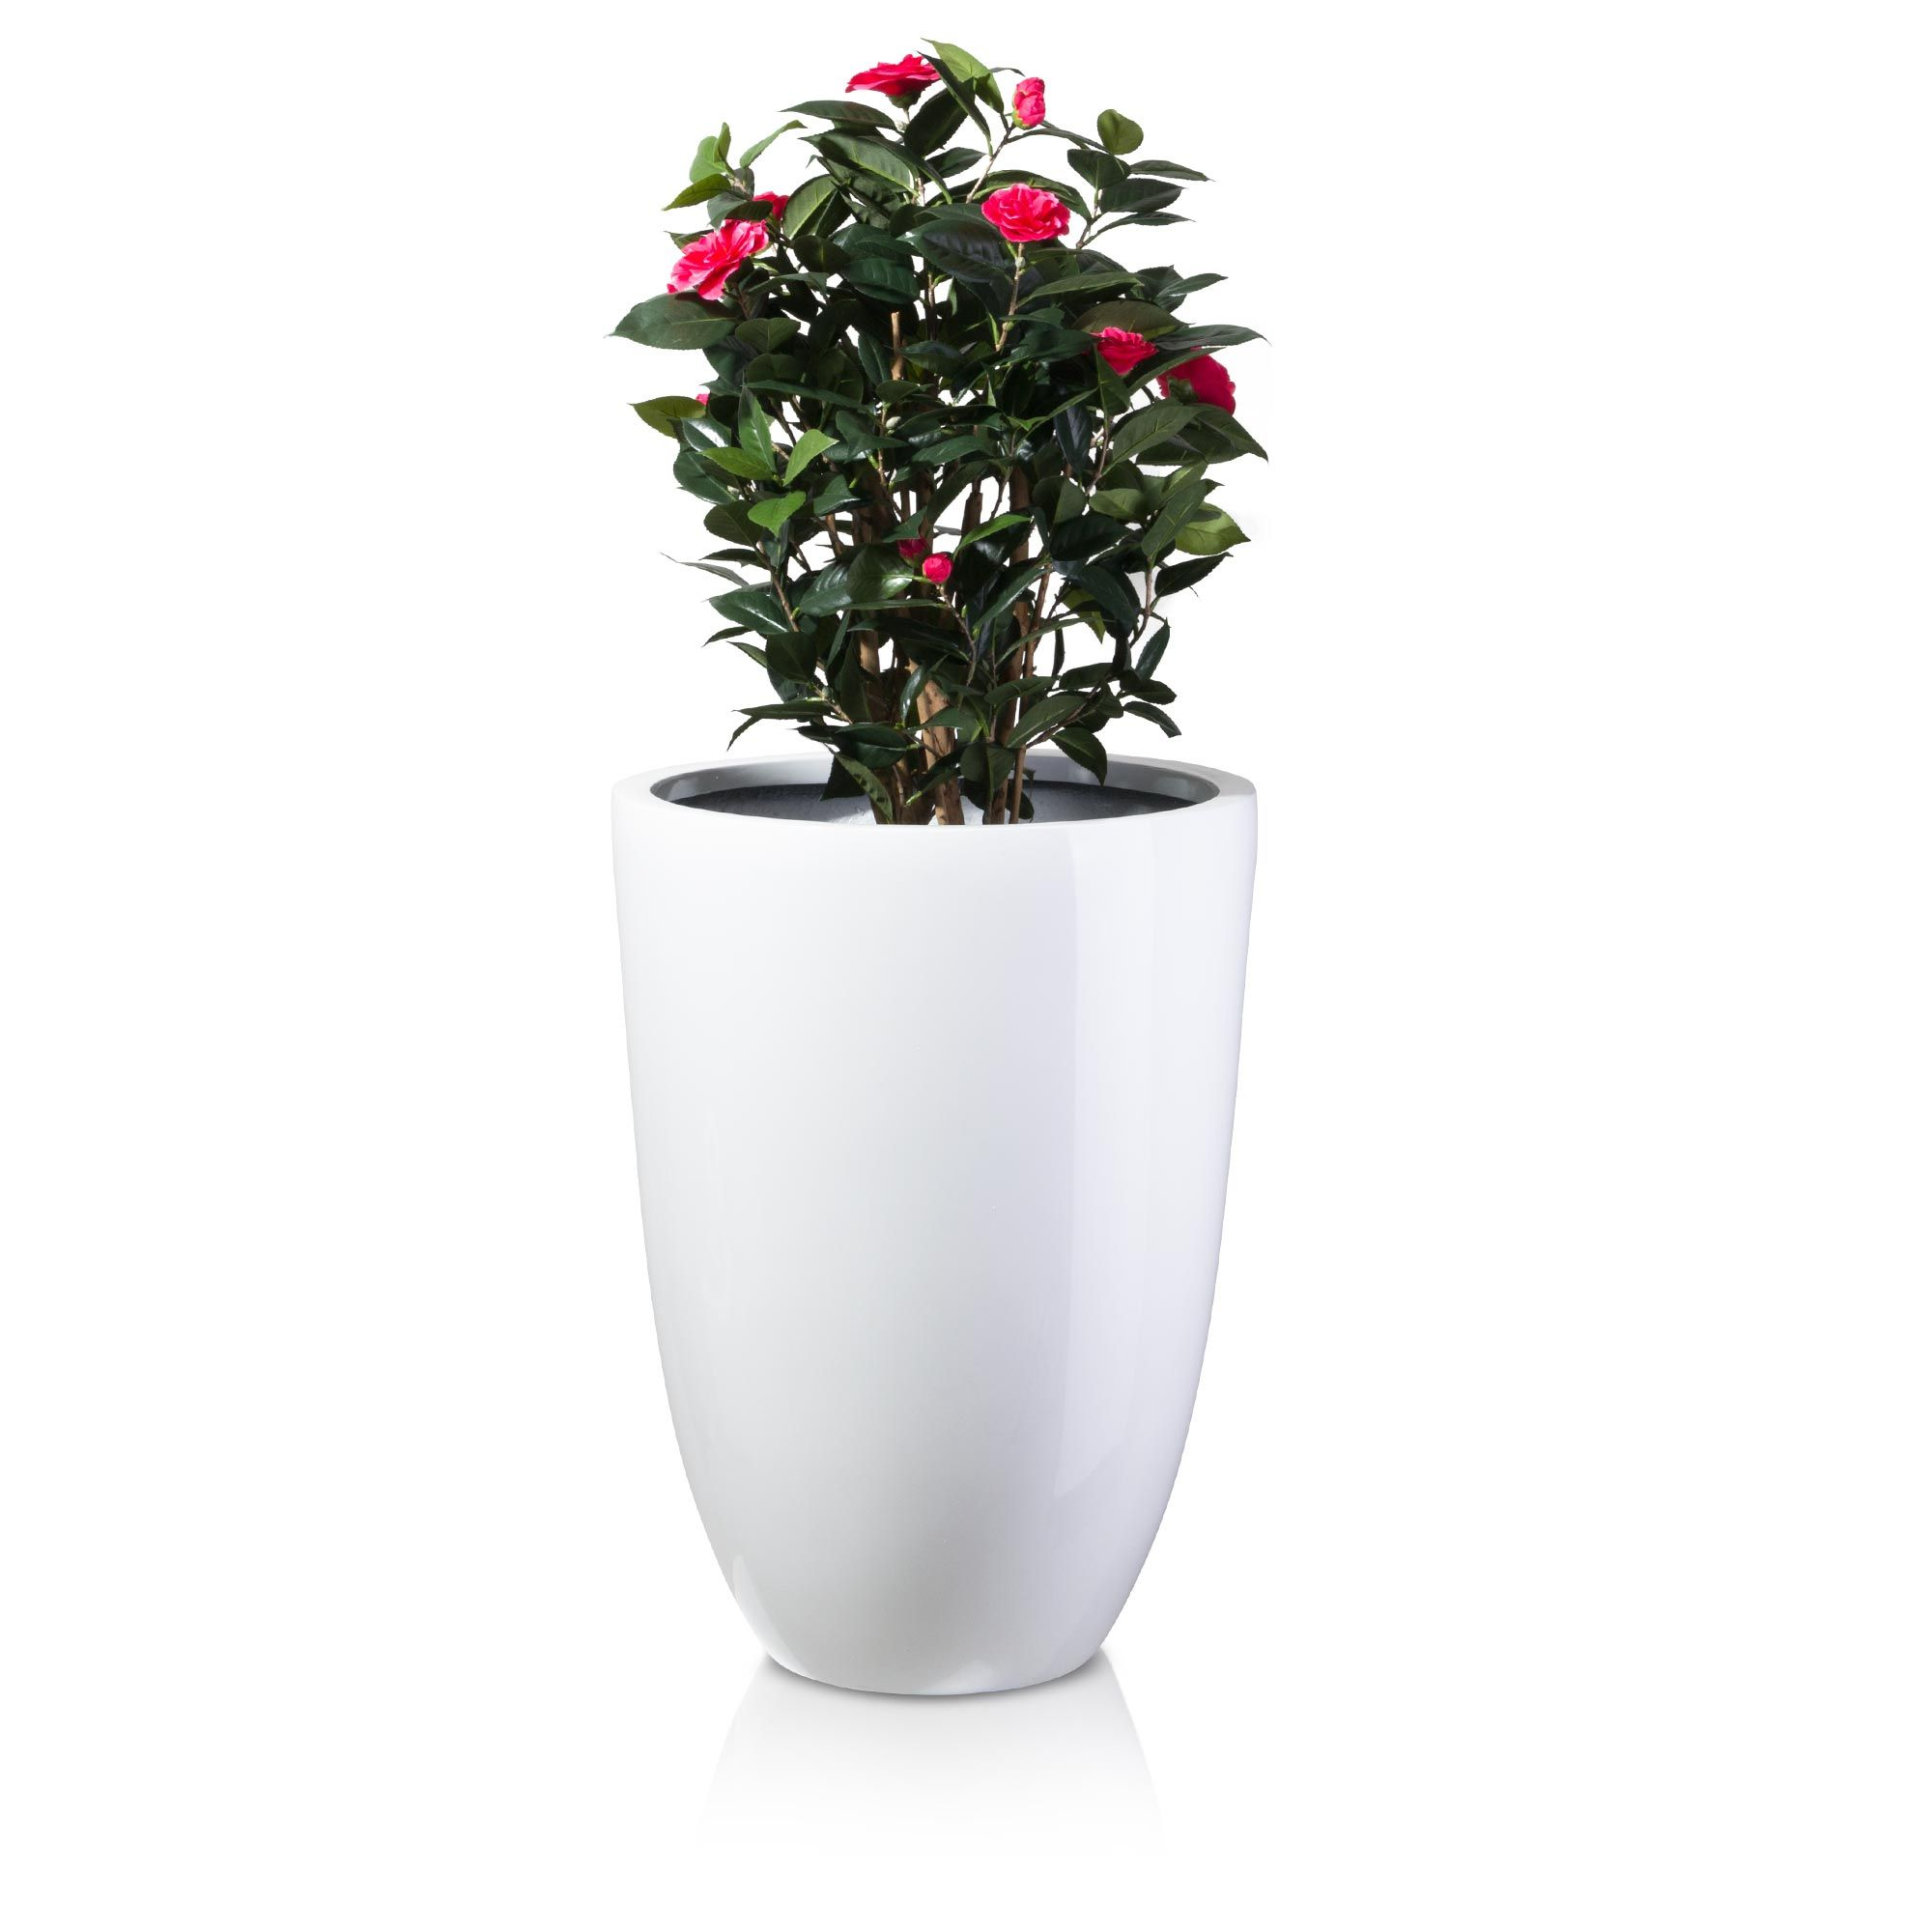 pflanzkübel leno 75 fiberglas weiß hochglanz | pflanzkübel fiberglas